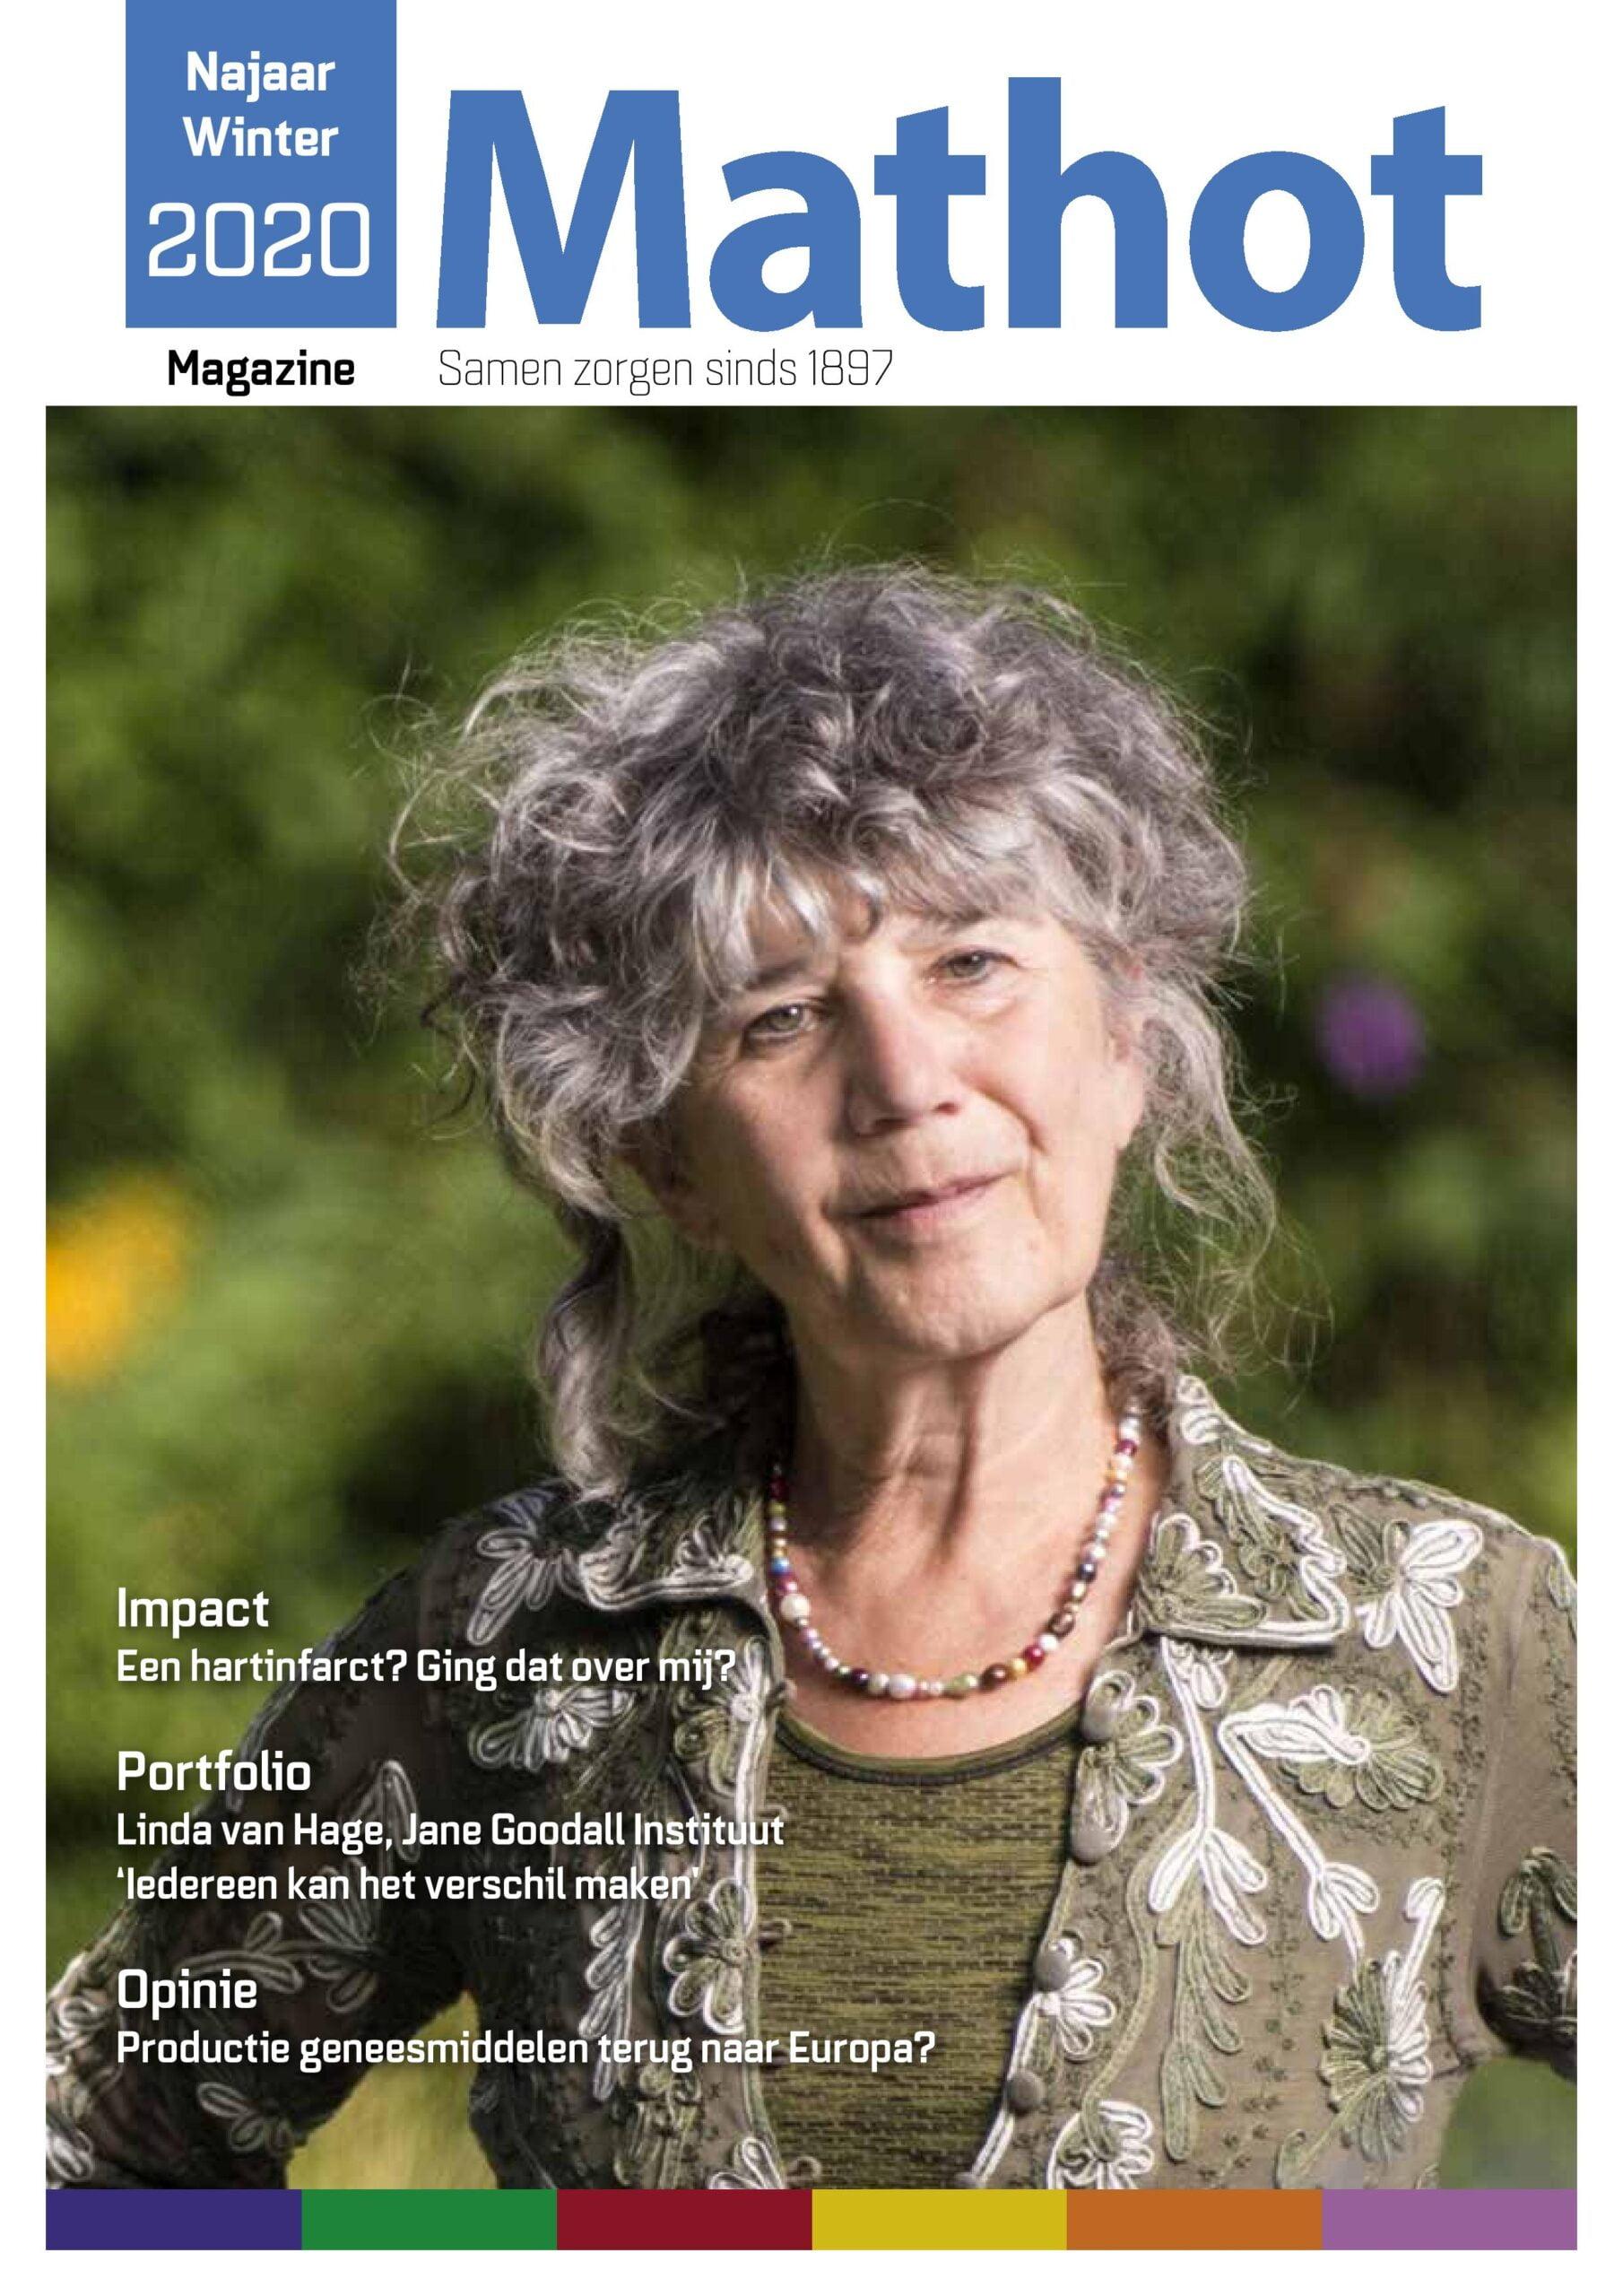 Tijdschrift Mathot Magazine cover - najaar-winter 2020